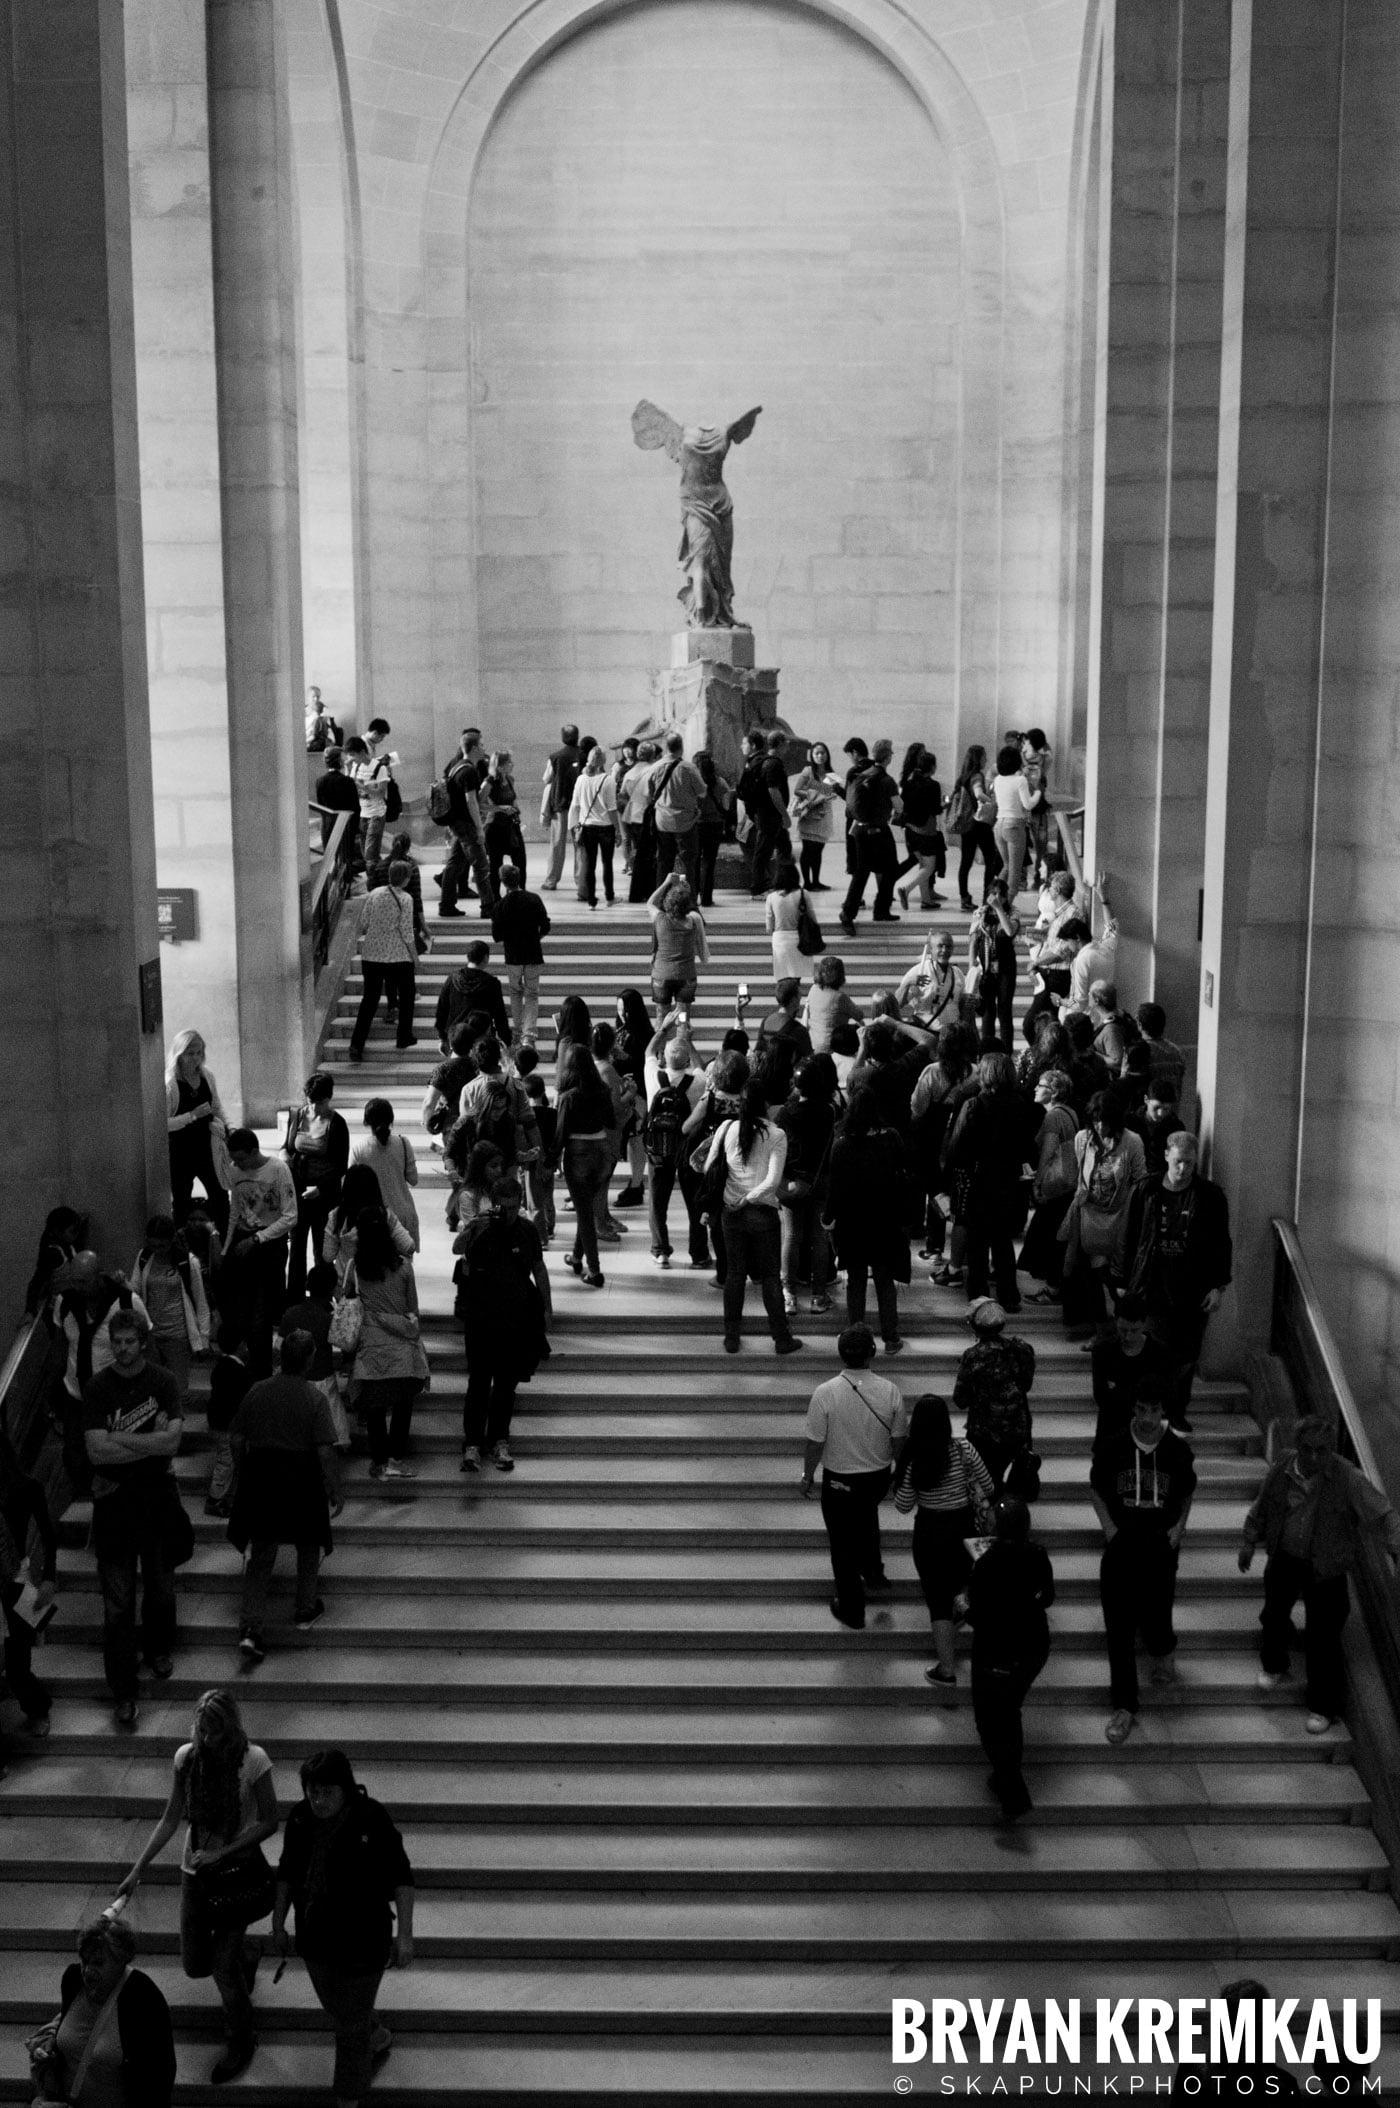 Paris, France Honeymoon - Day 4 - 7.21.11 (15)